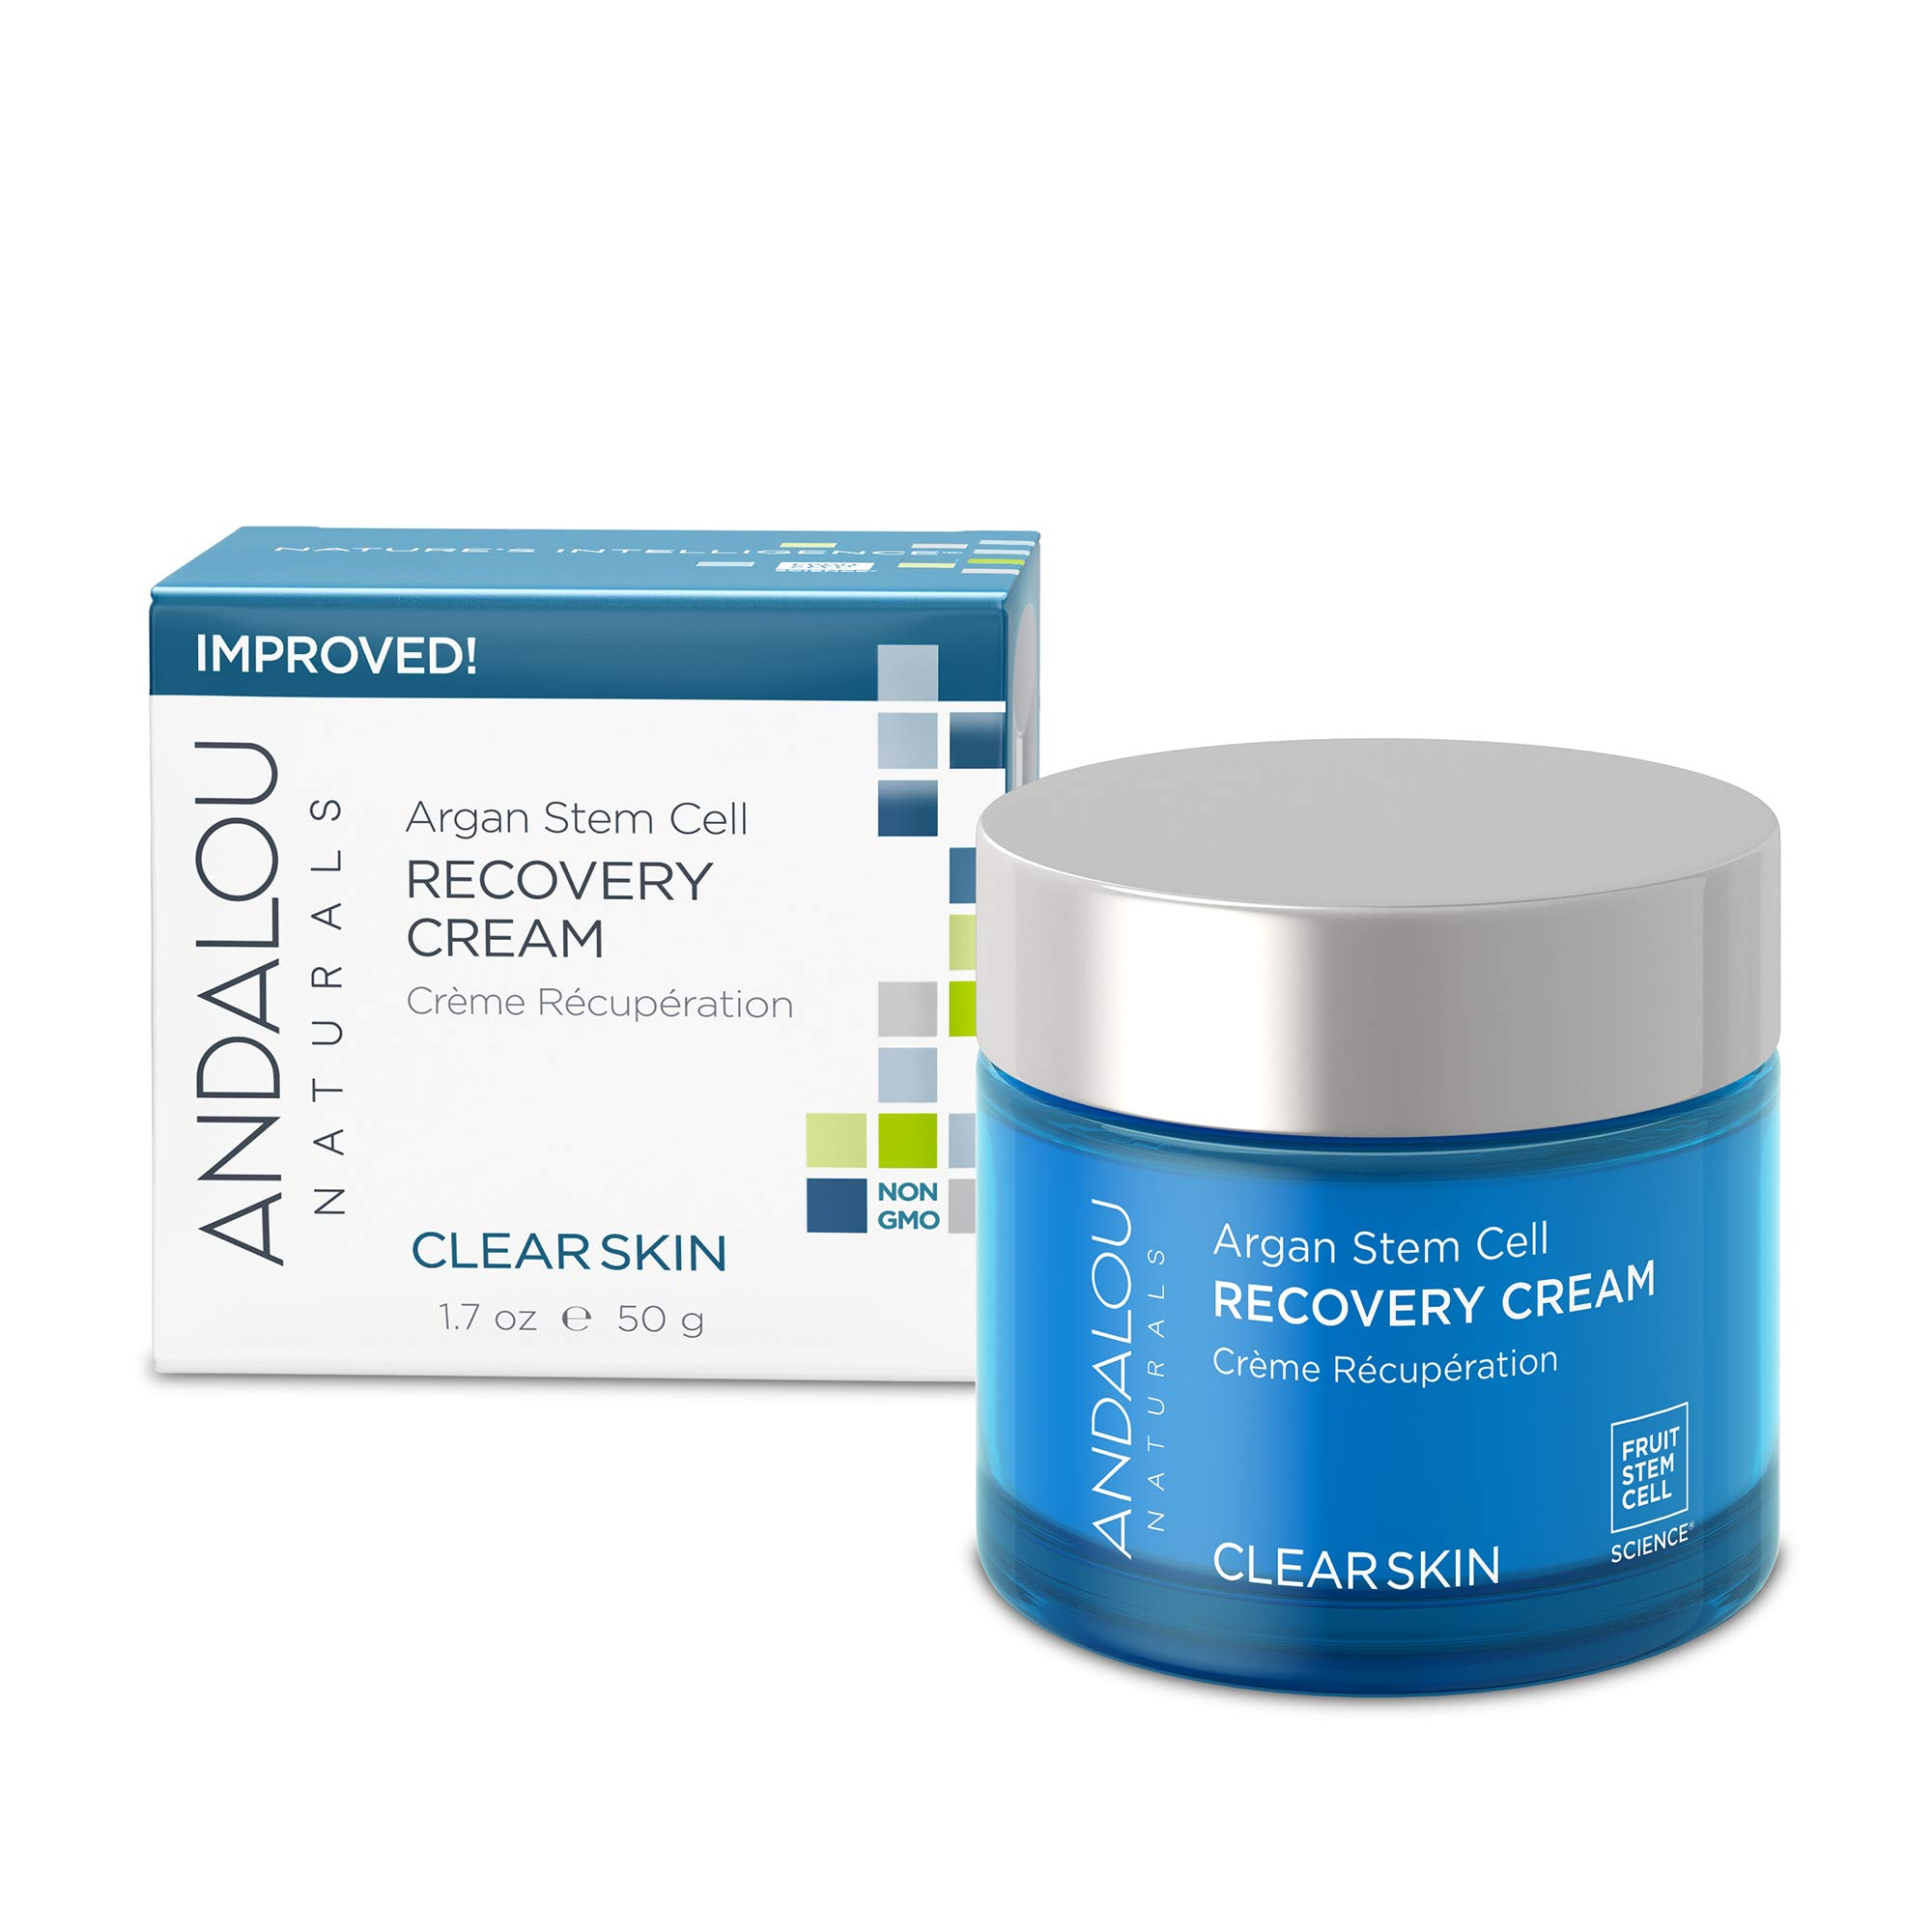 Andalou Naturals Argan Stem Cell Recovery Cream, 1.7 Ounces